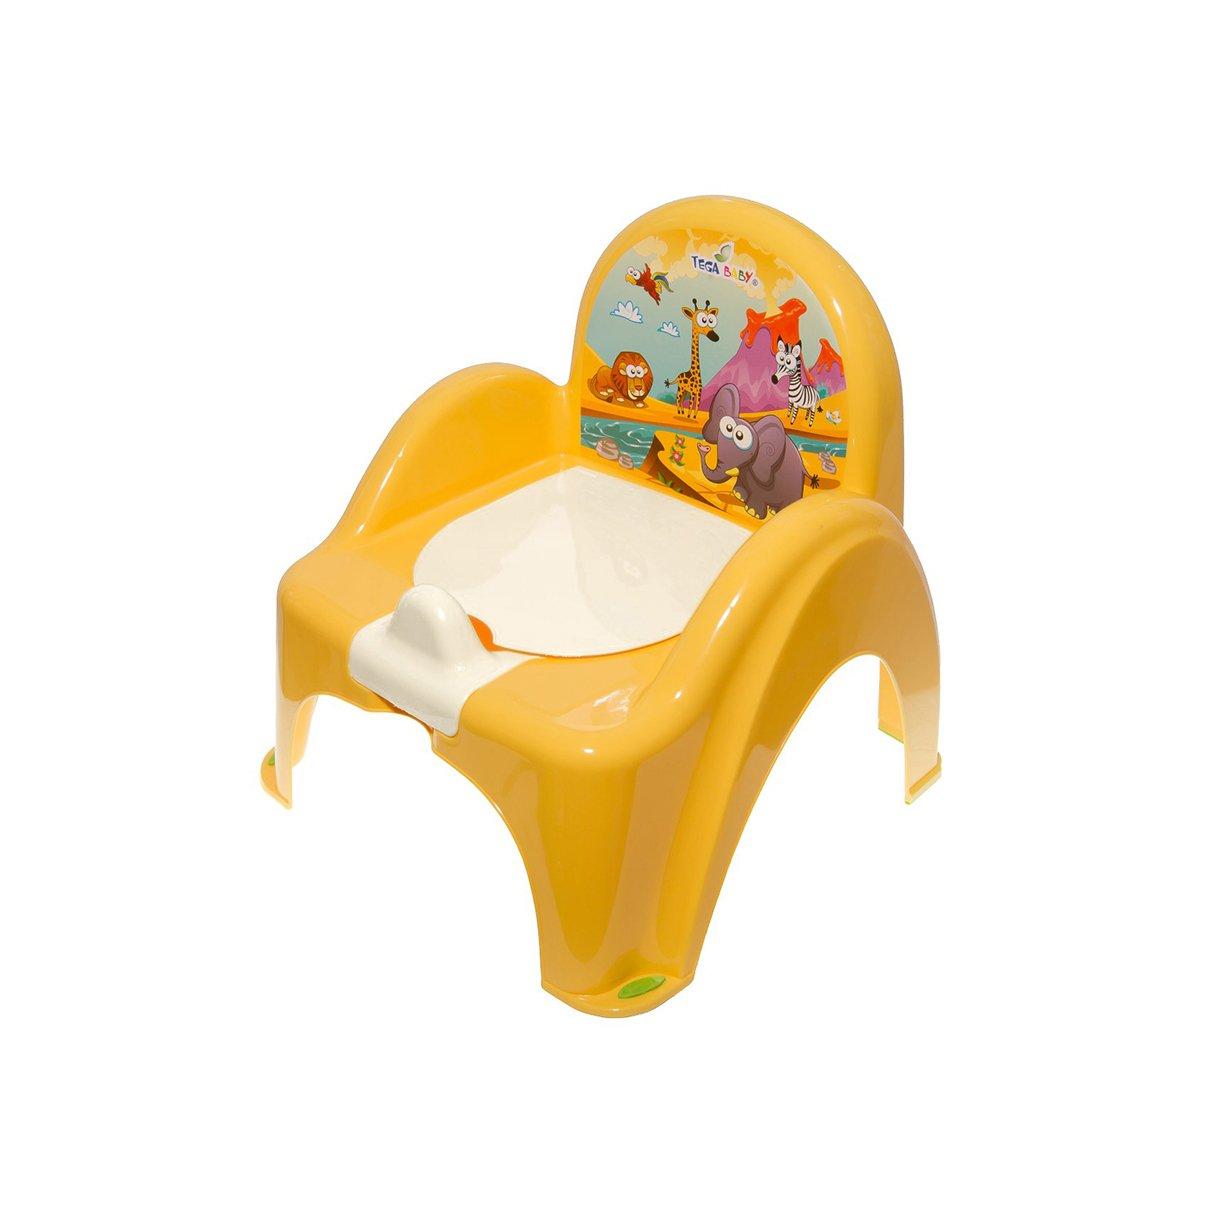 Bērnu podiņš-krēsls TegaBaby SAFARI yellow SF-010